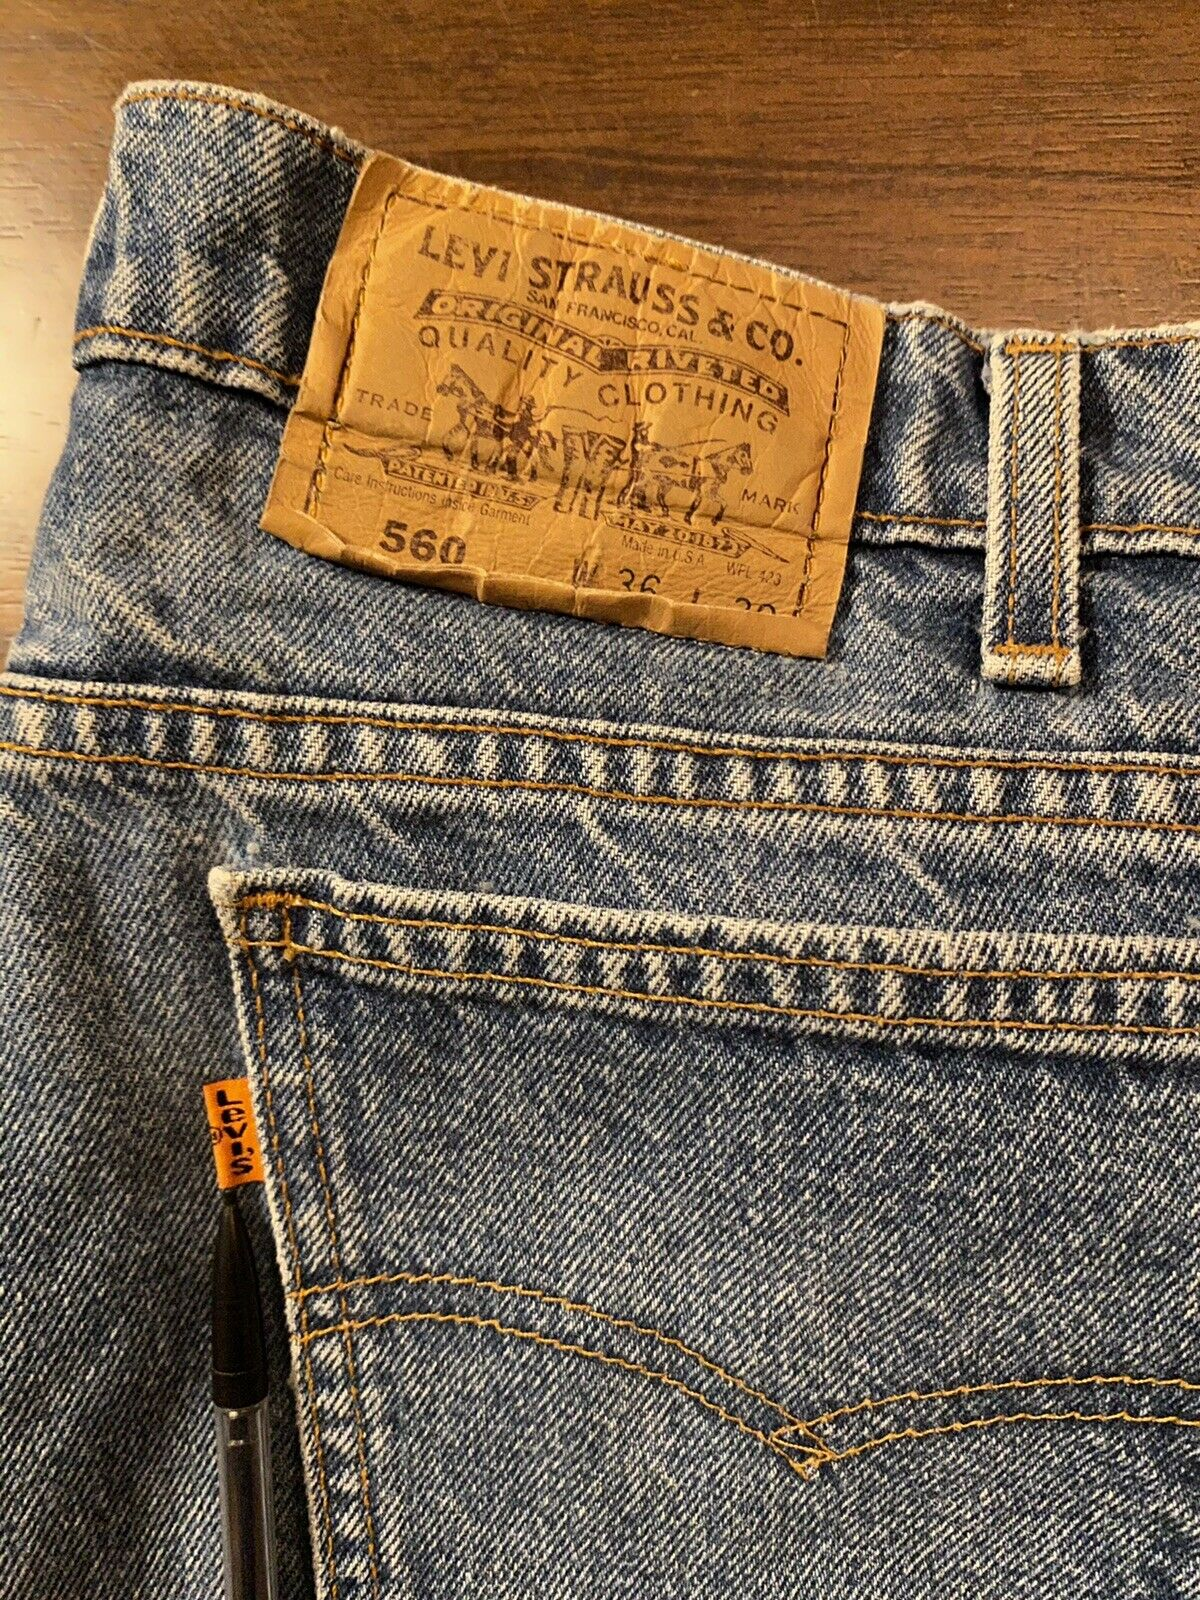 Vintage Levis (Orange Tab) Made In USA - image 1